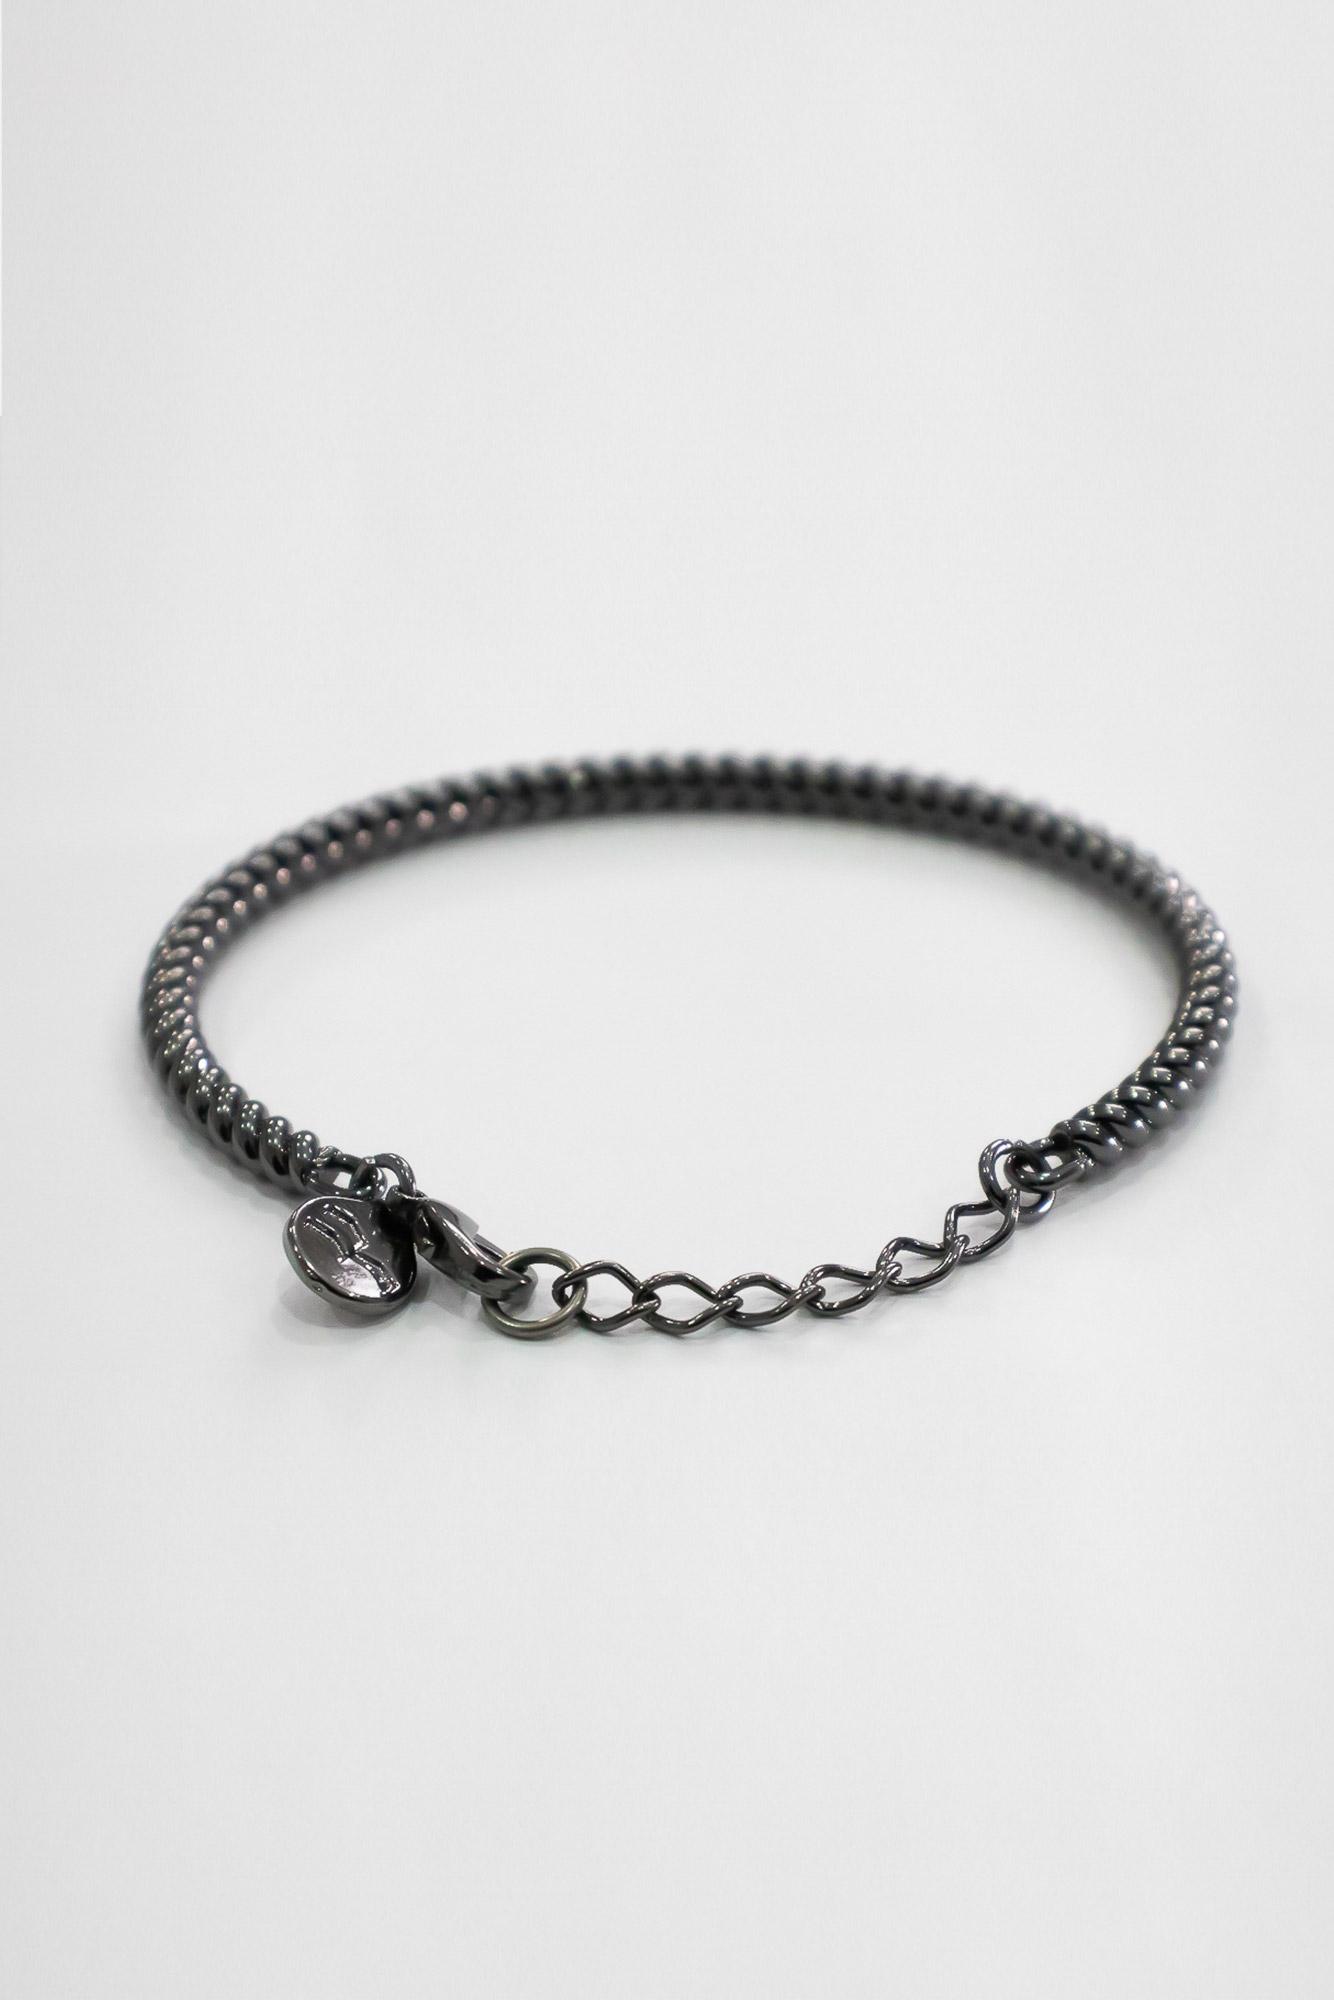 Bracelete Rigido Torcido Onix